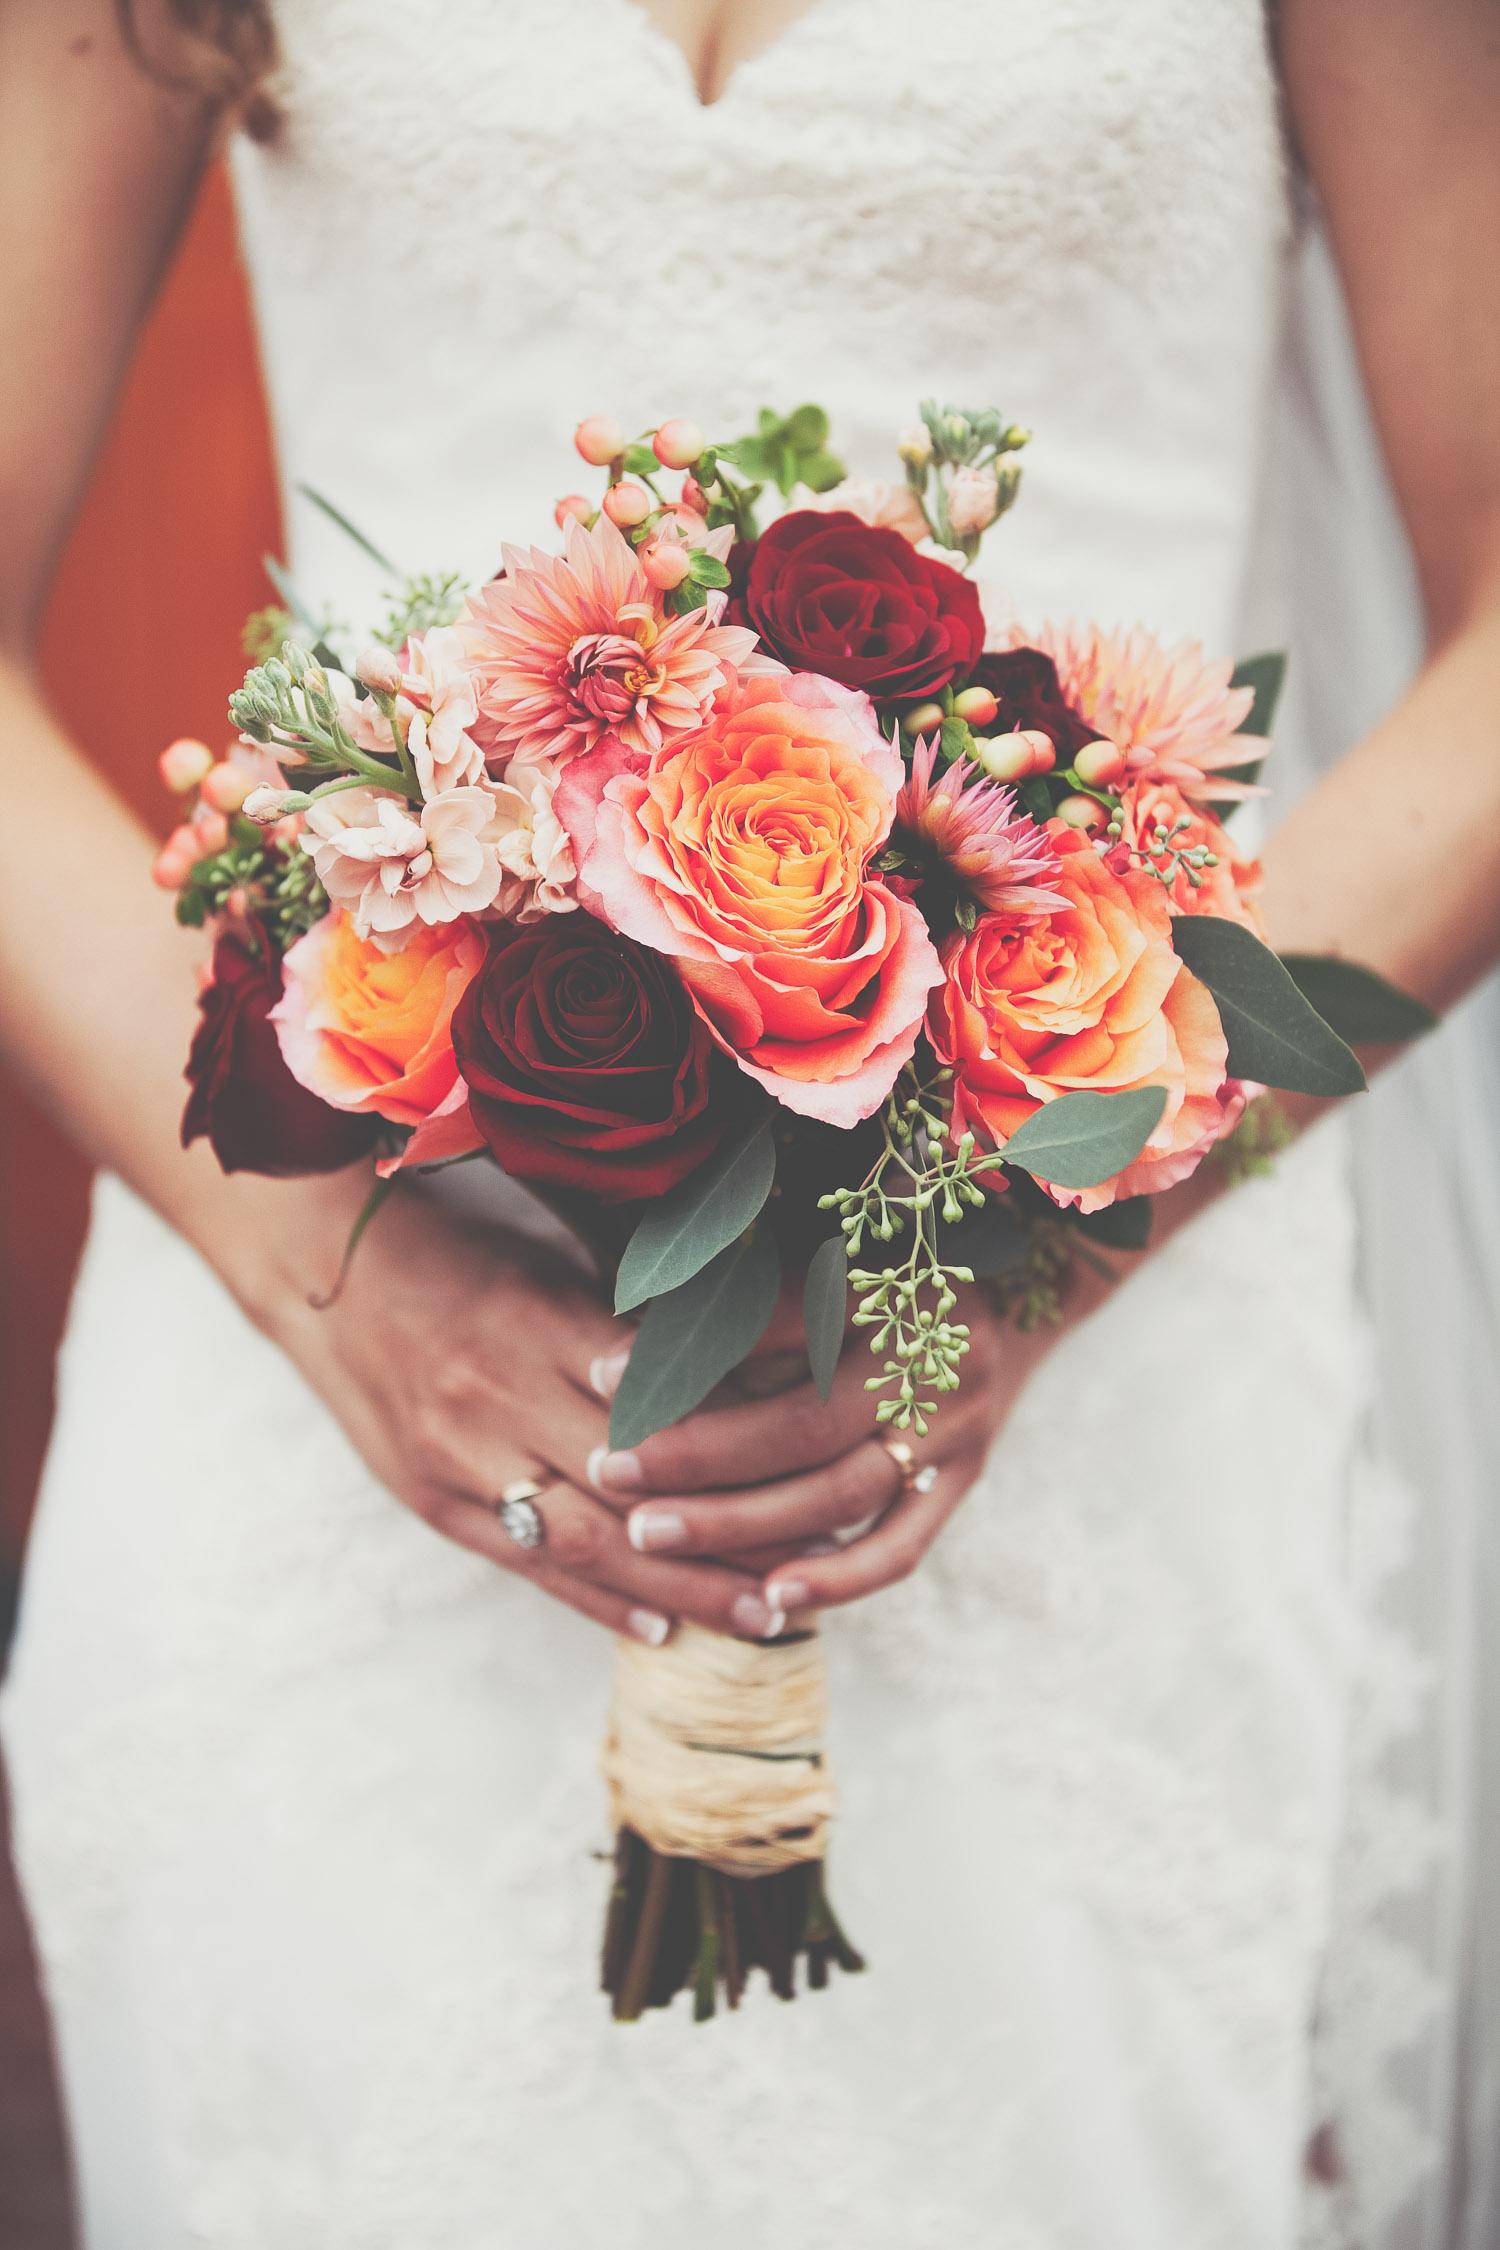 JMPHOTOART-Wedding-Photographer-163.jpg